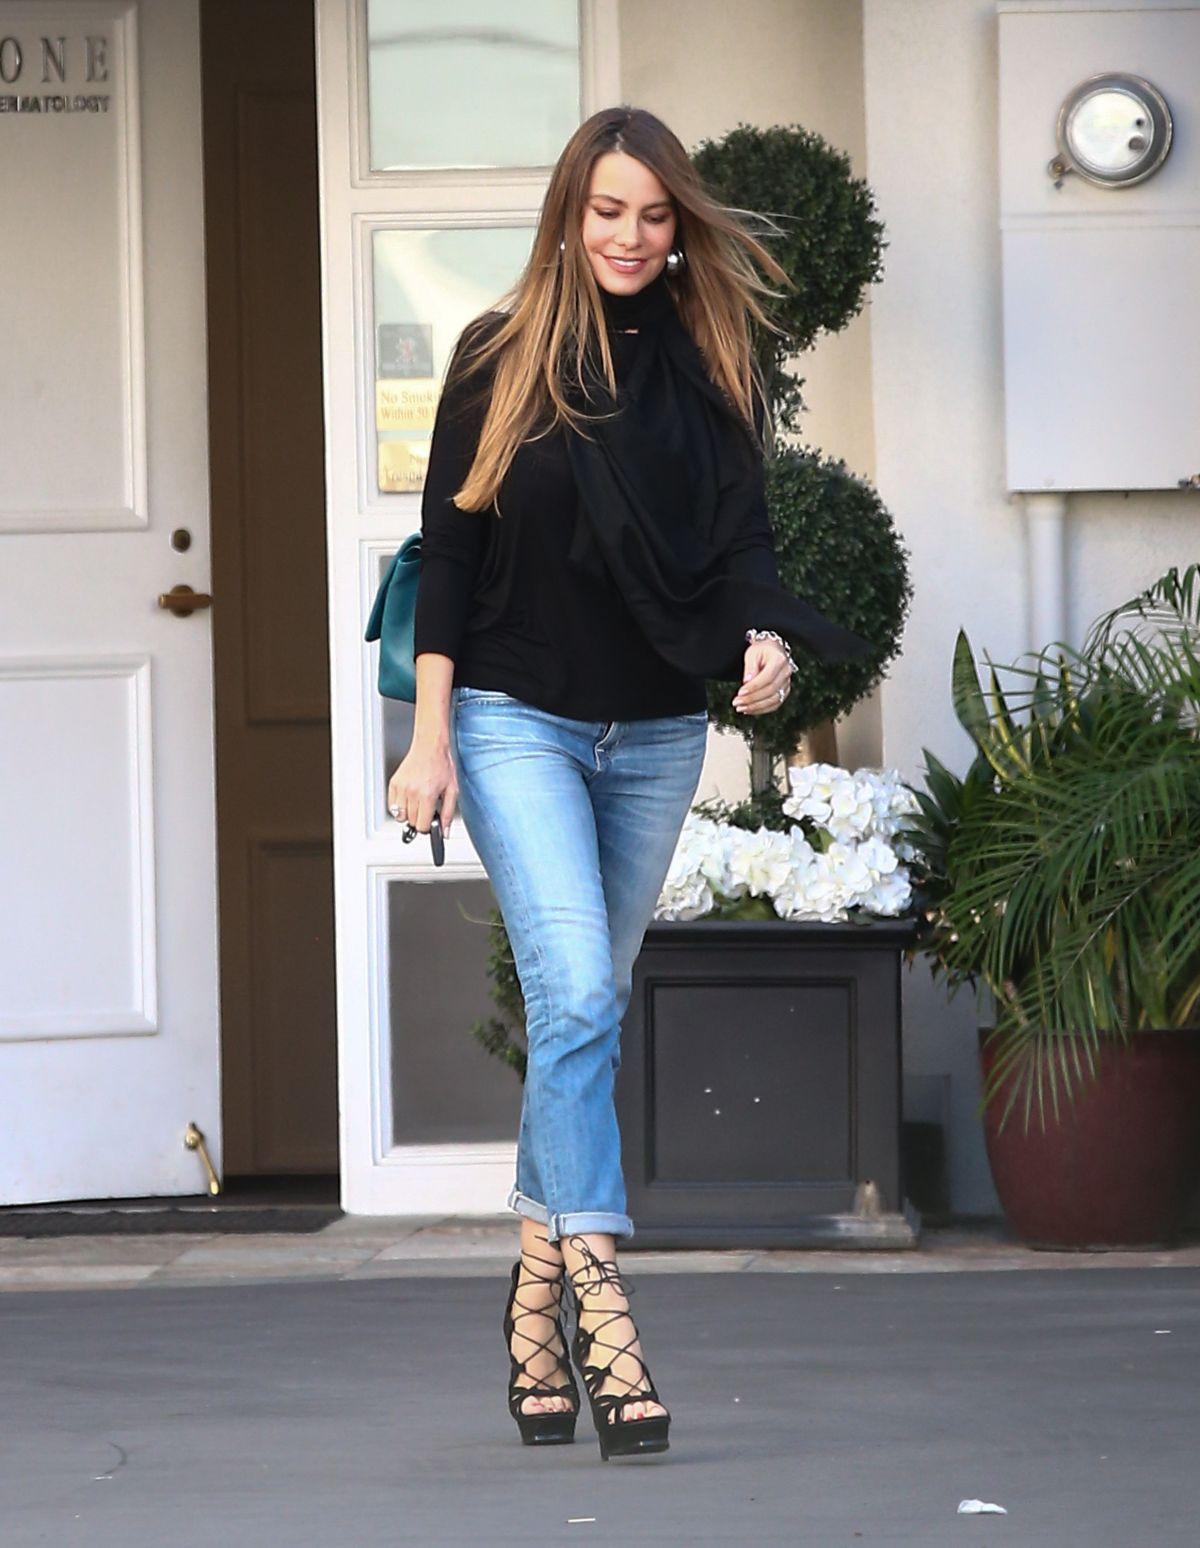 HD Photos of Sofia Vergara Leaves Epione Skin Care Clinic, Beverly Hills